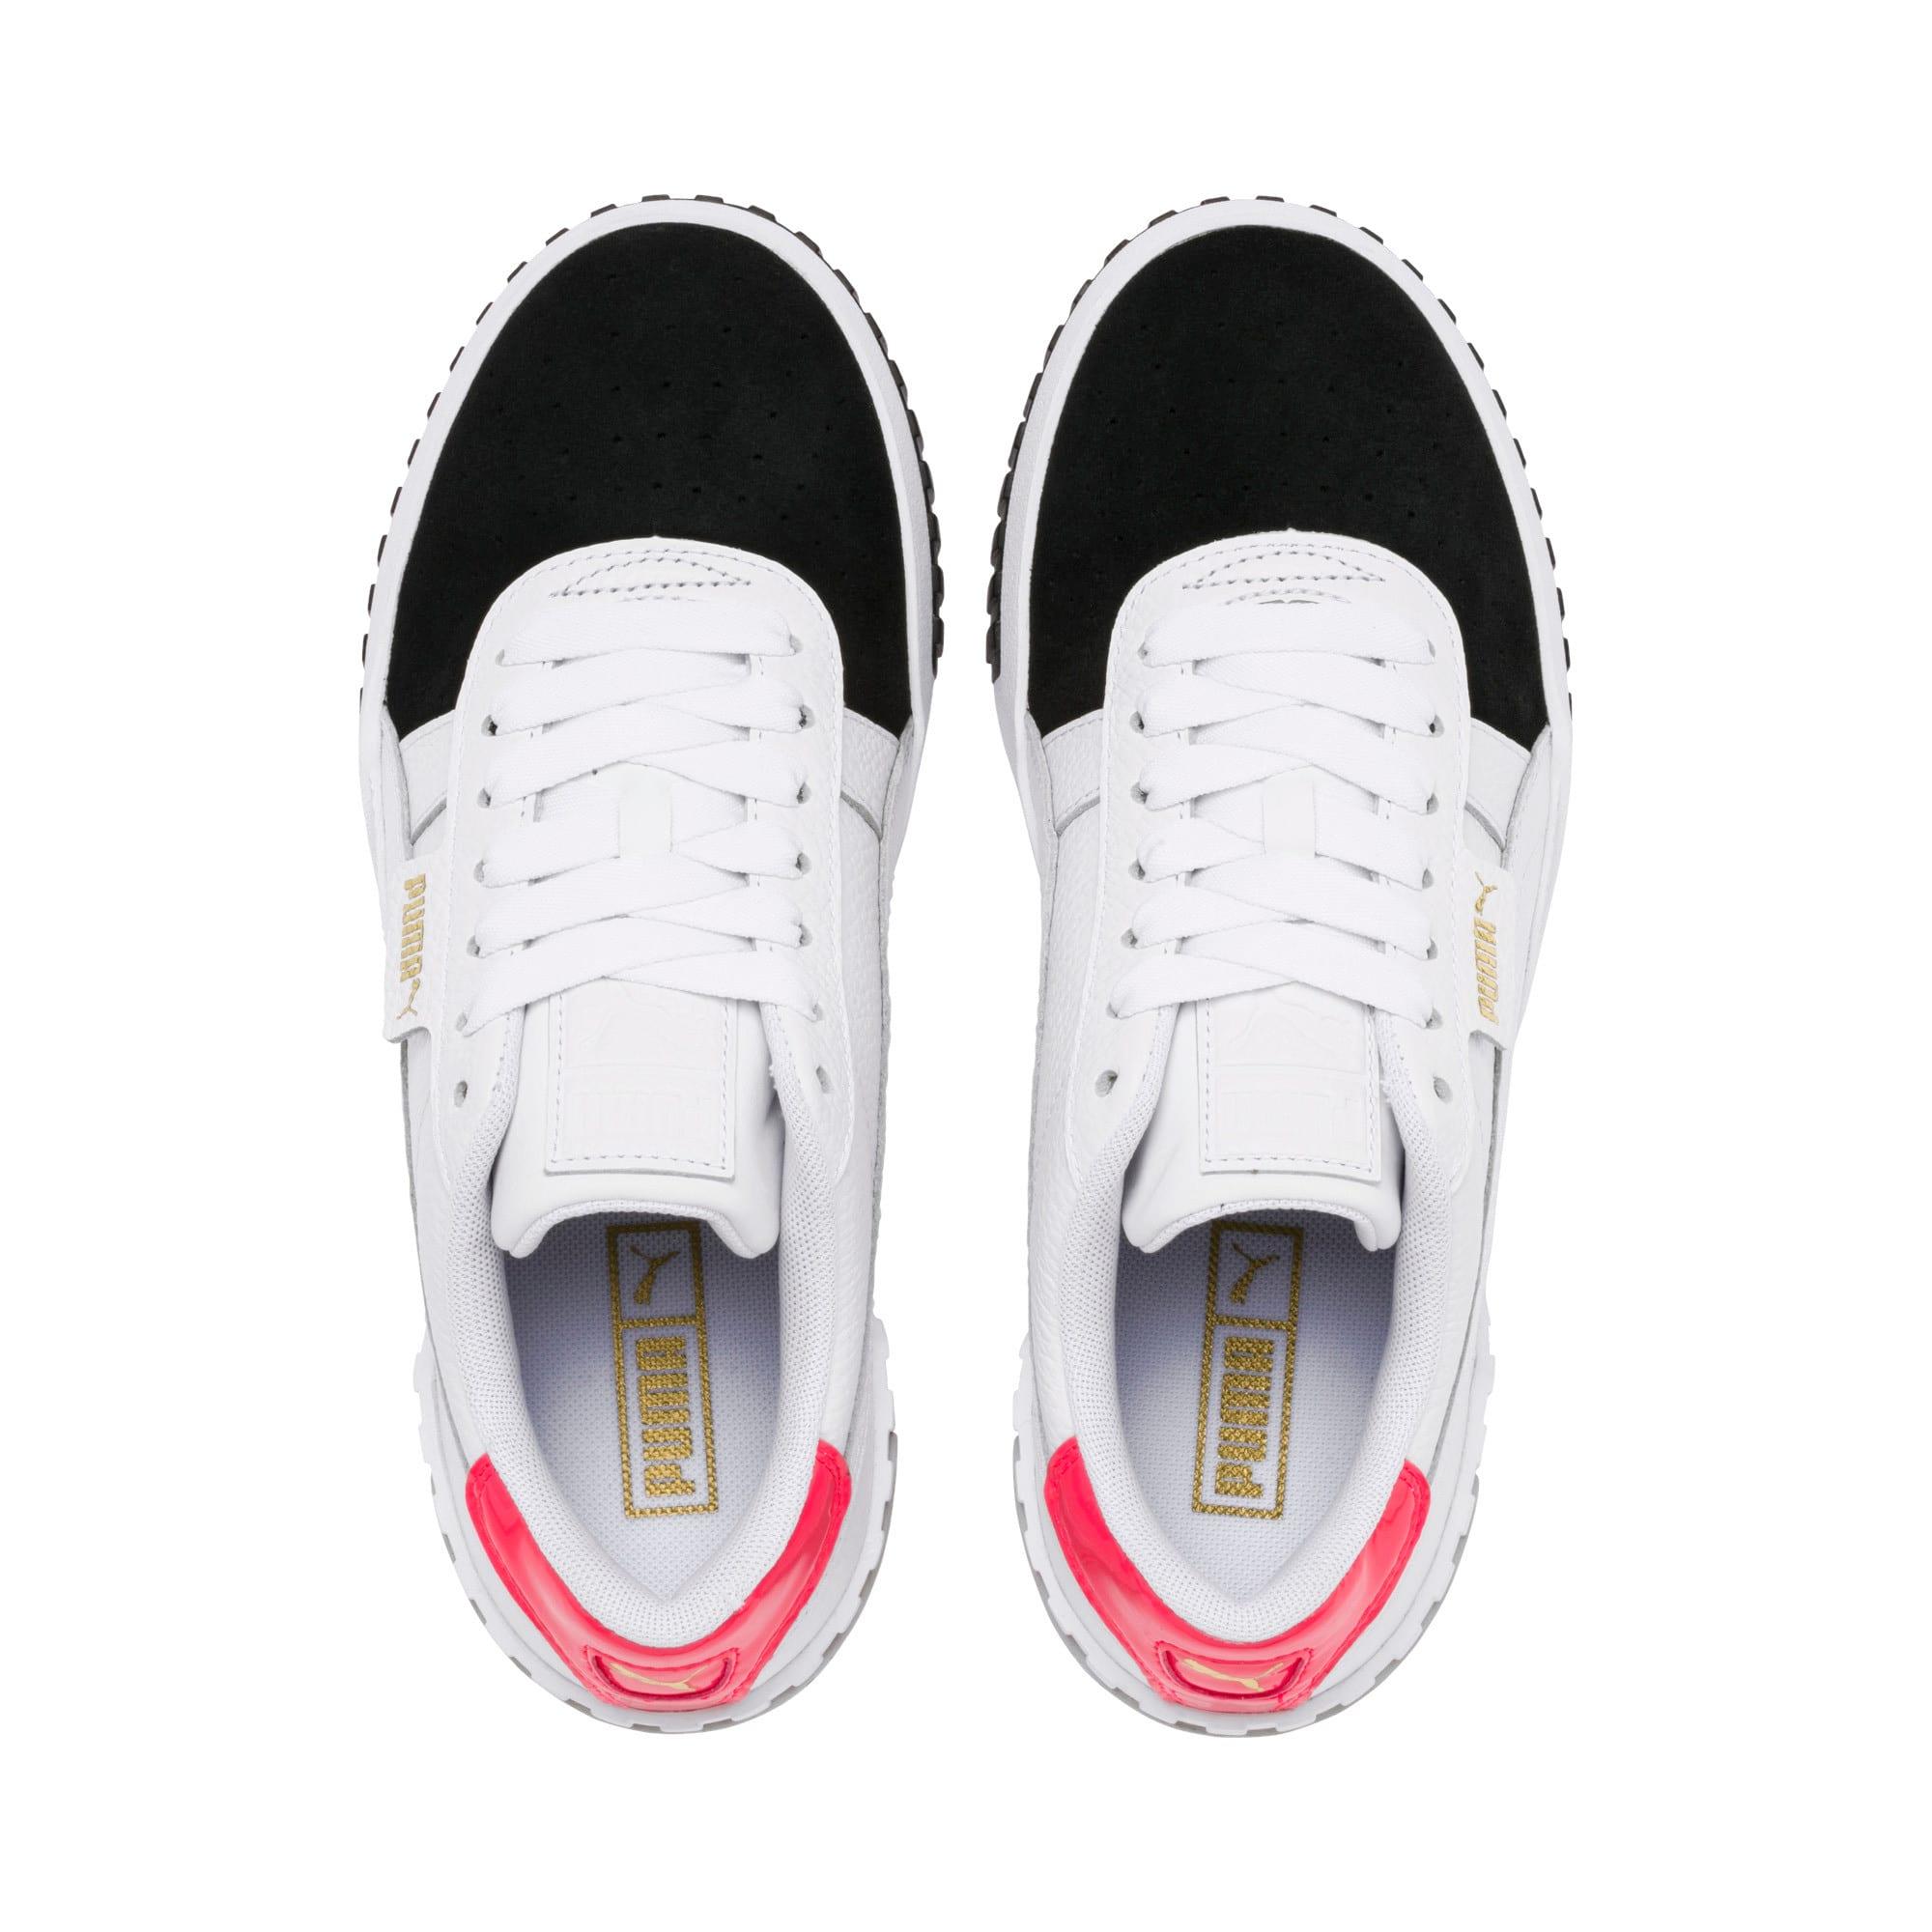 Thumbnail 7 of Cali Remix Women's Sneakers, Puma White-Puma Black, medium